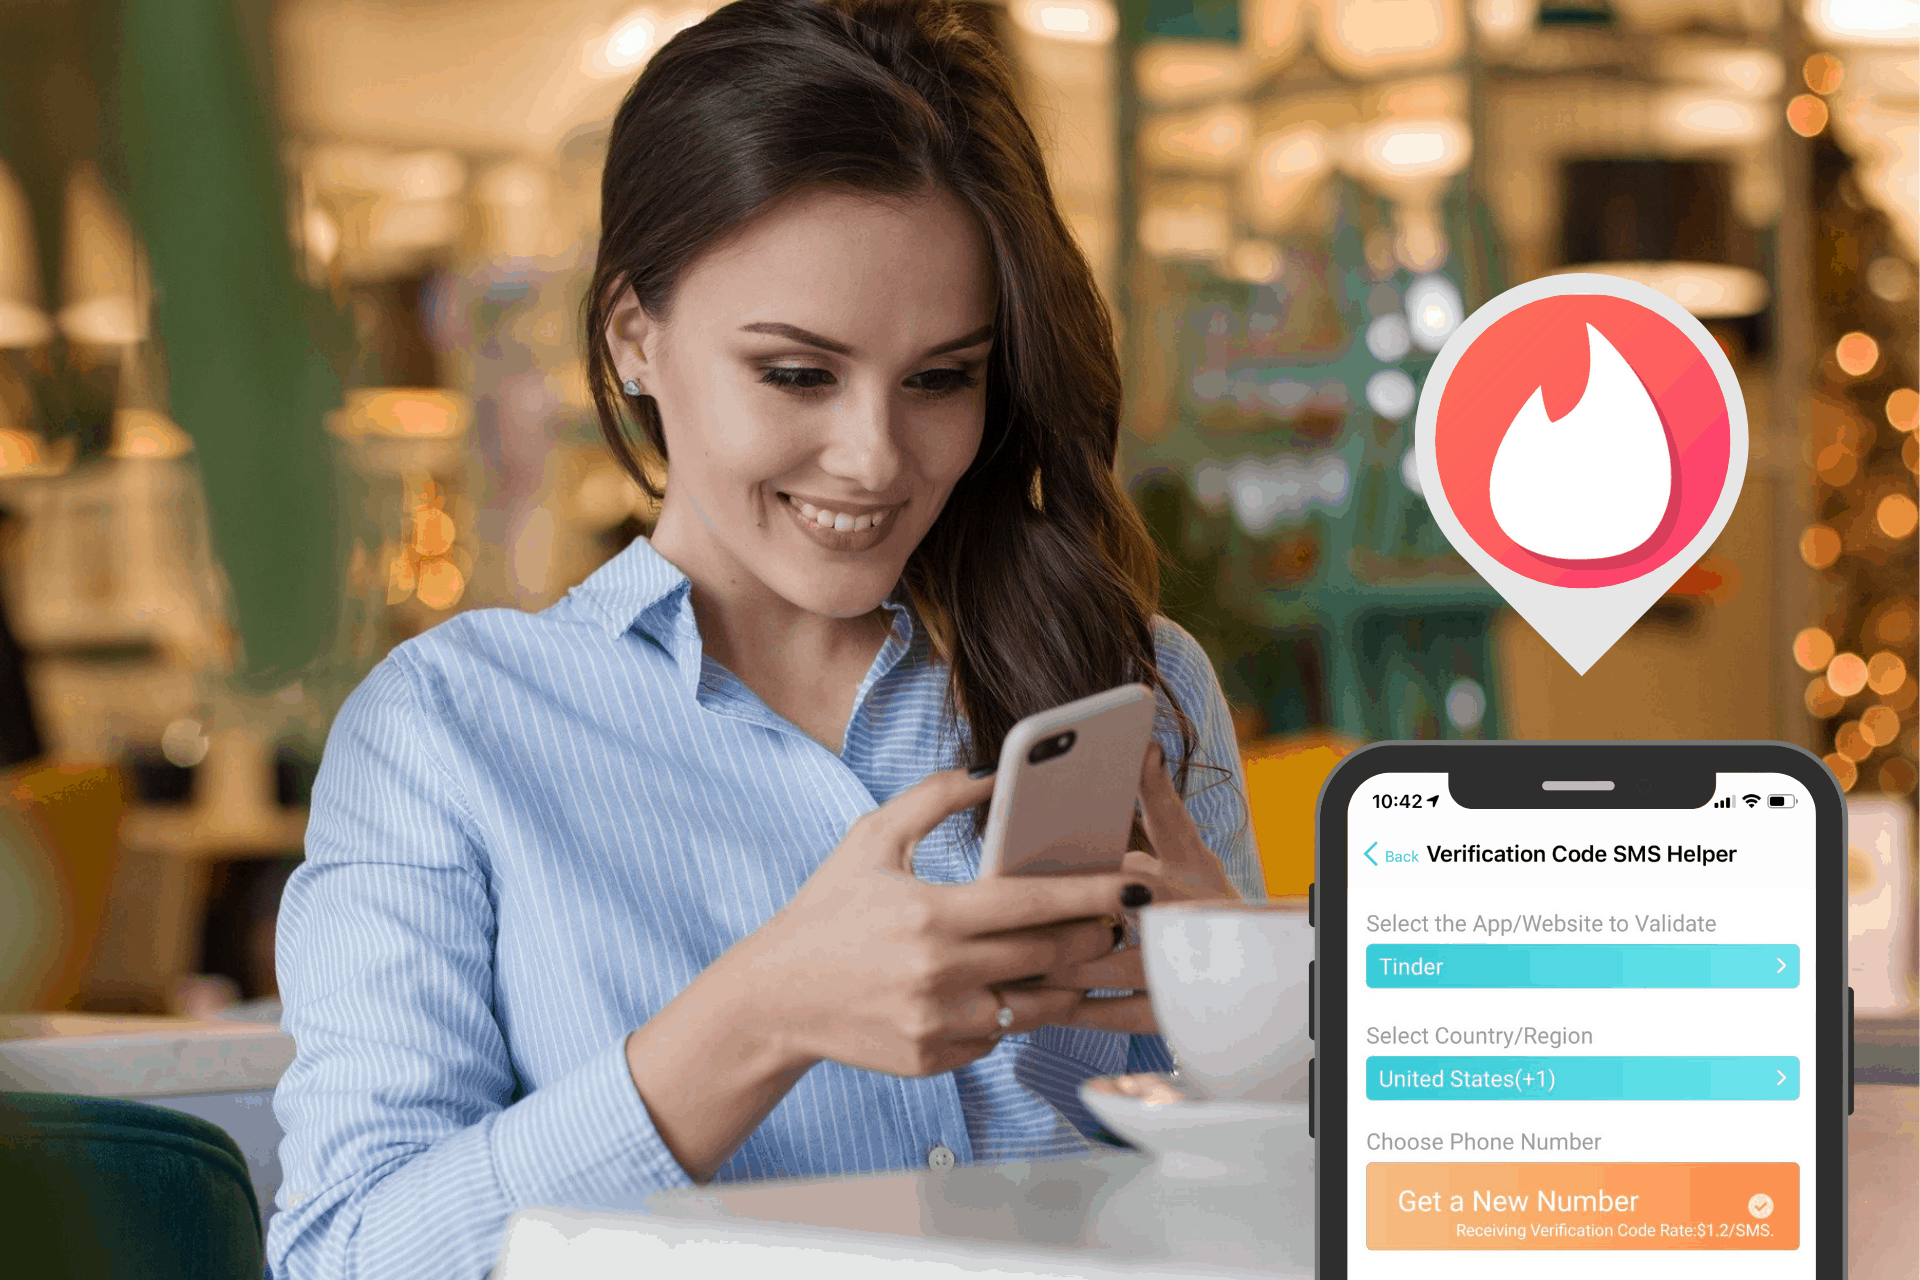 Tinder login with code